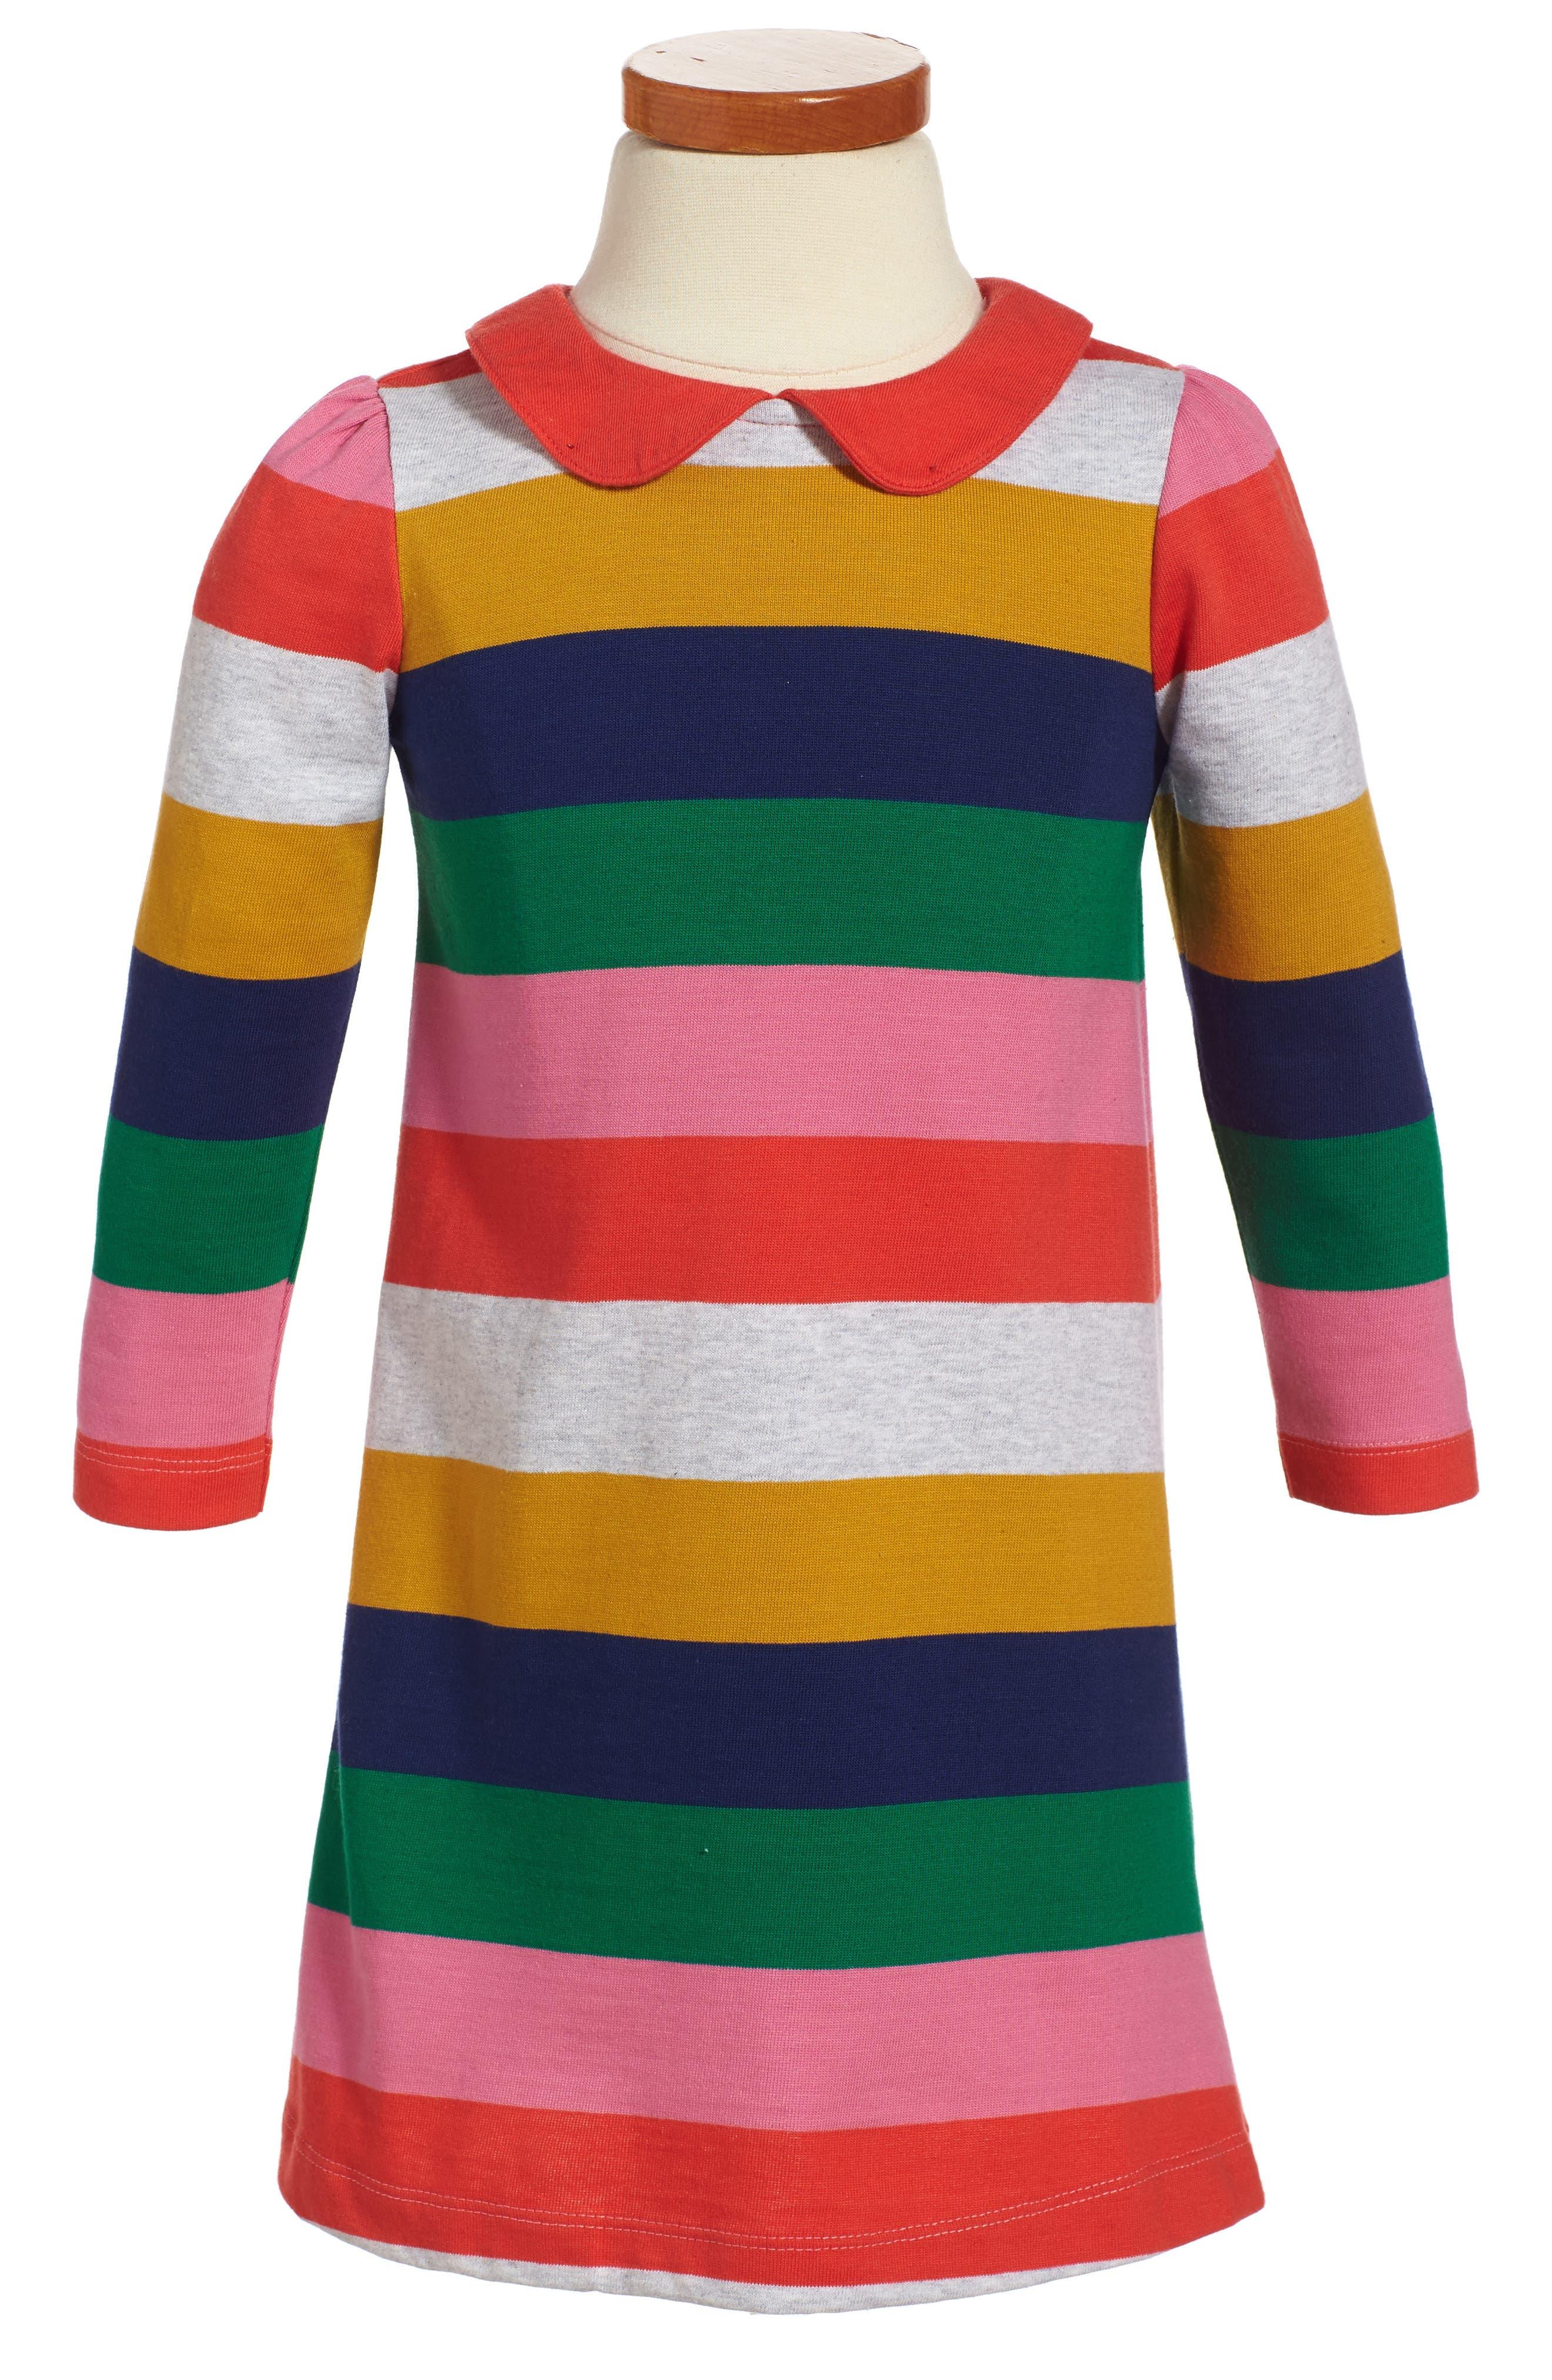 Collared Jersey Dress,                             Main thumbnail 1, color,                             651